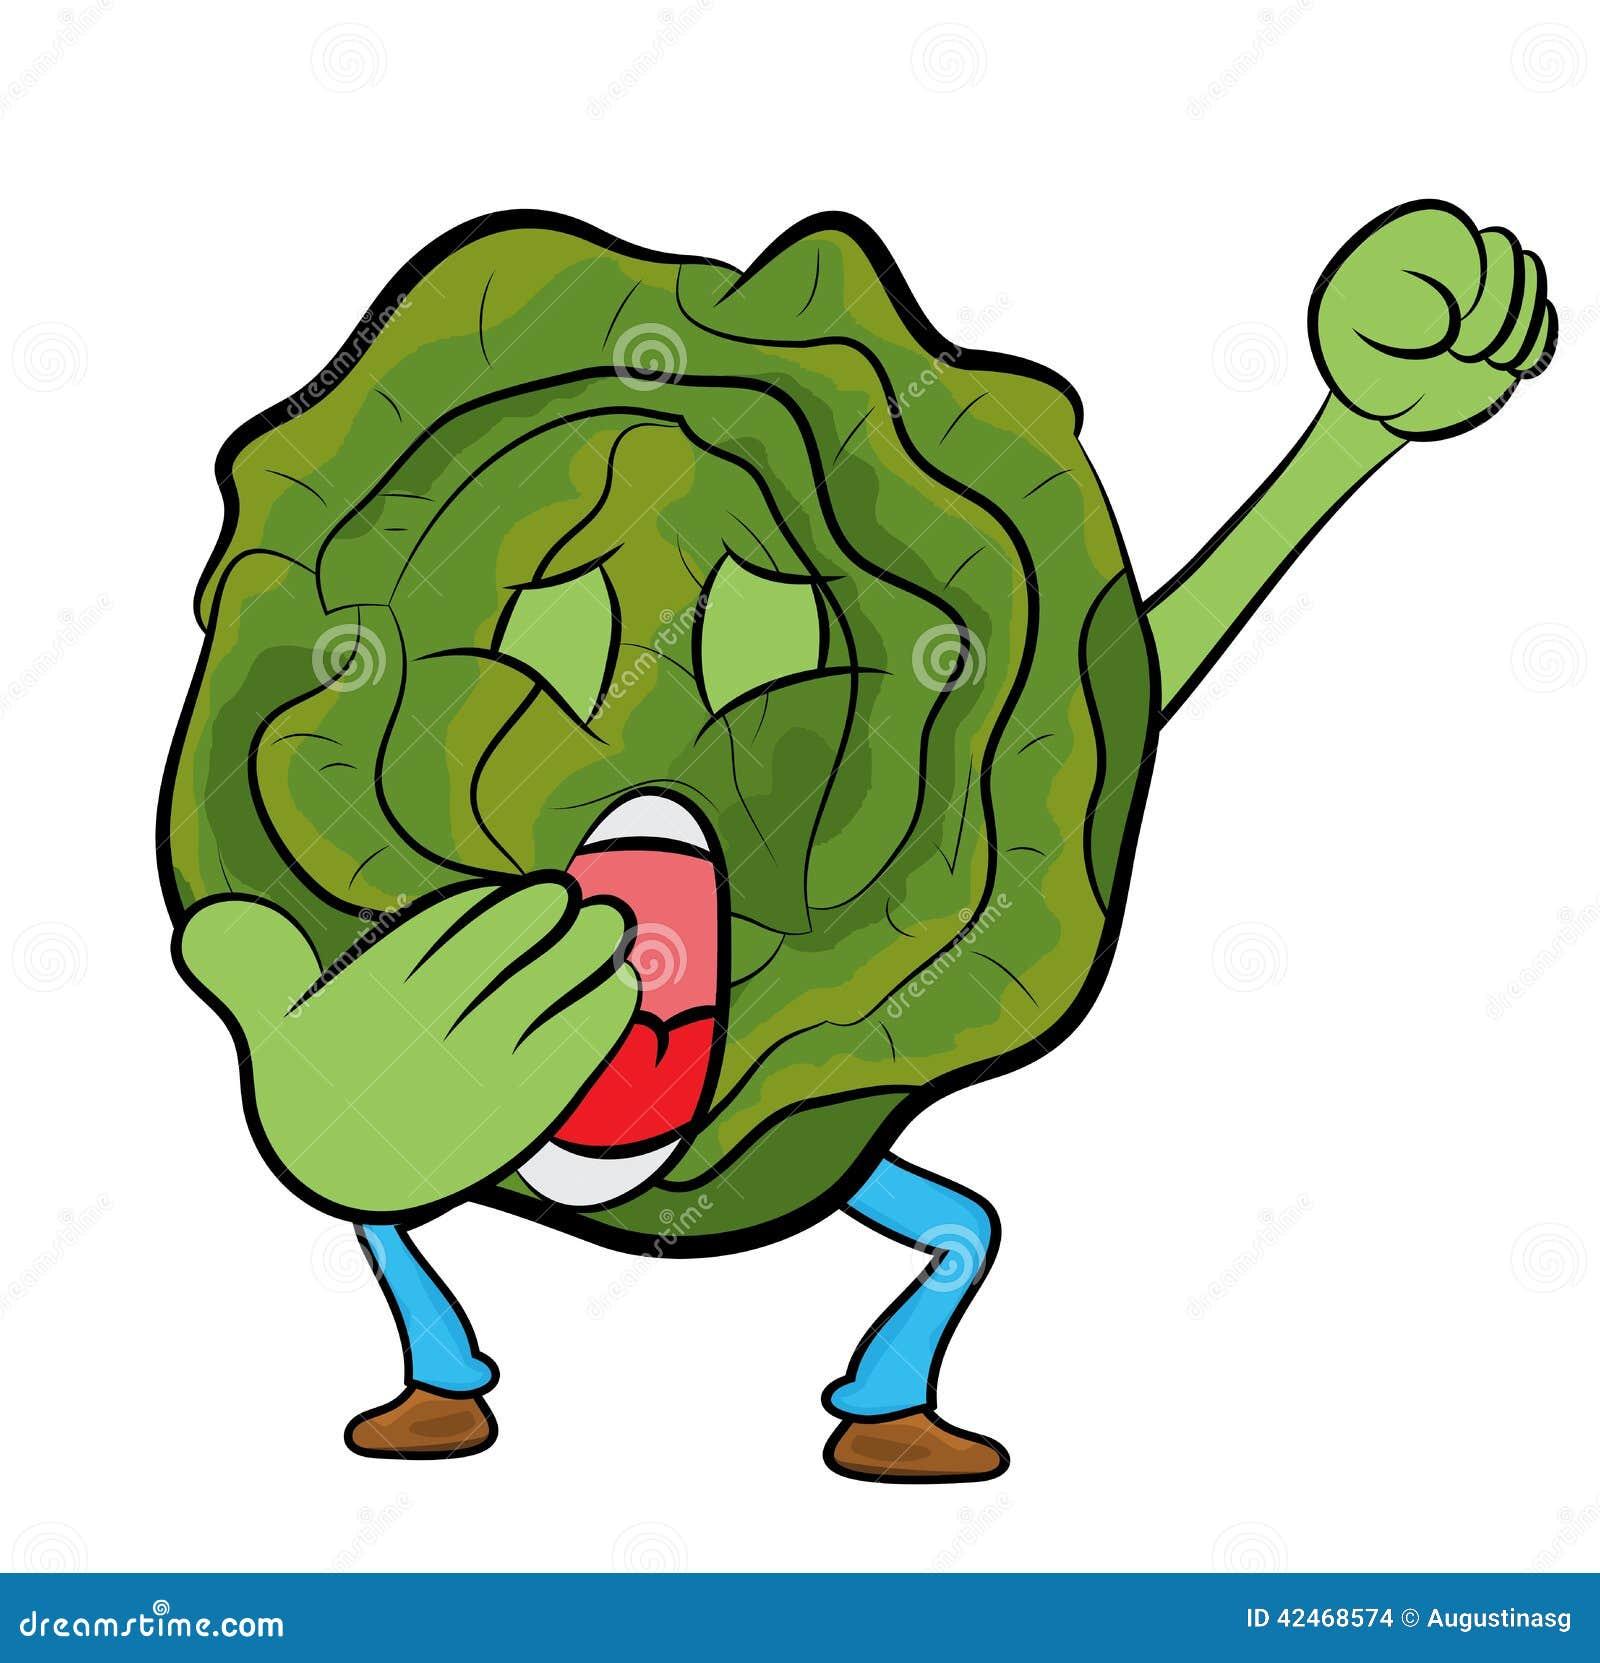 Vector Character Design Illustrator : Cabbage cartoon character stock illustration